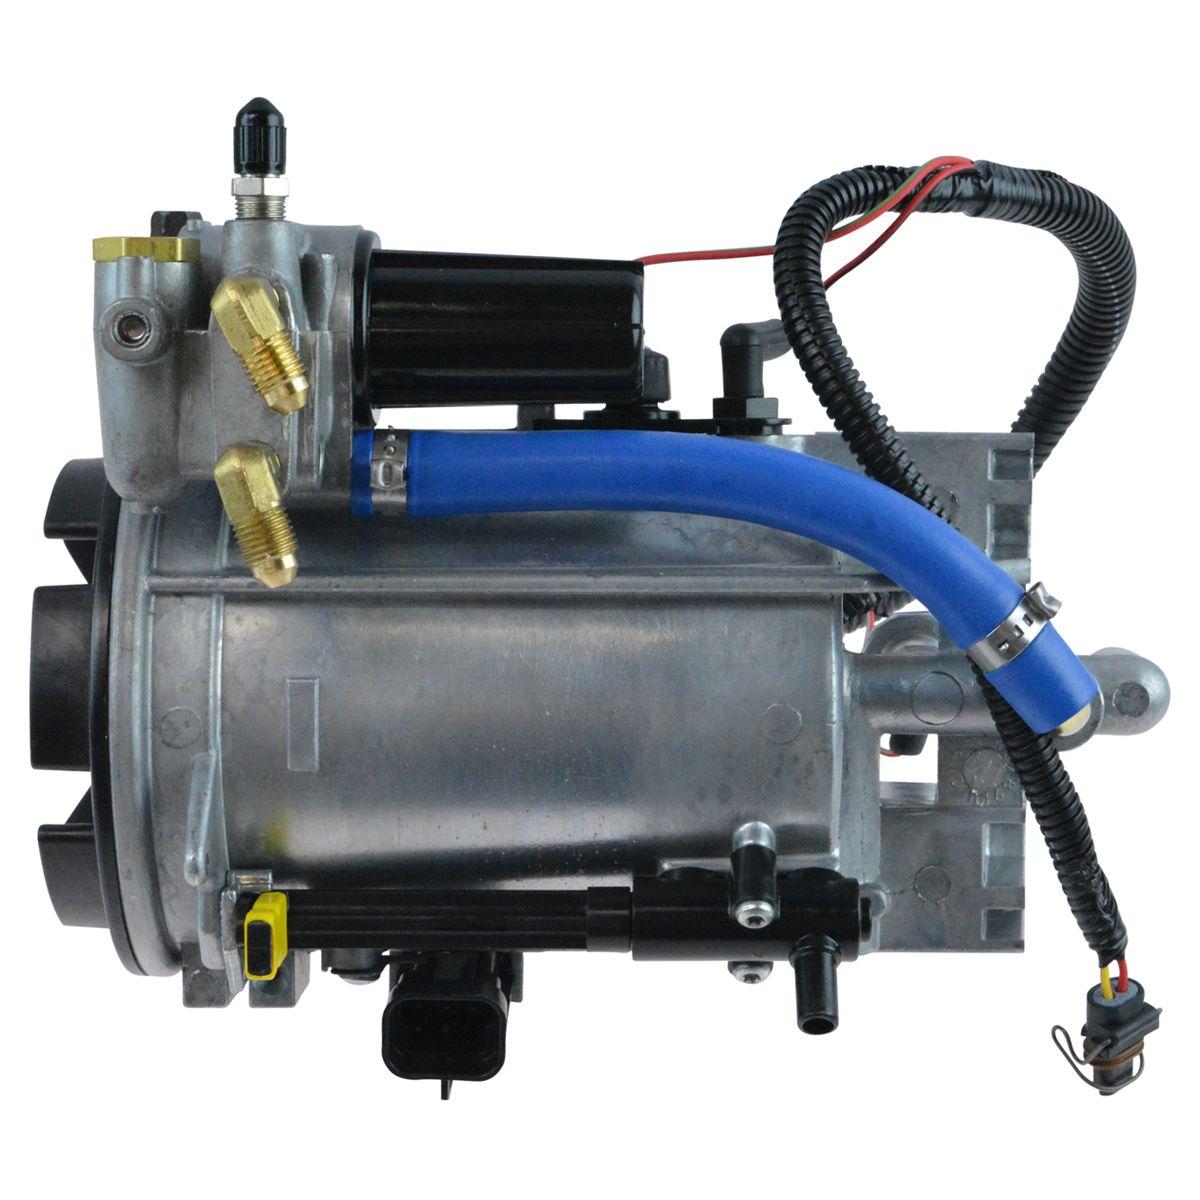 Motorcraft Fg1052 Fuel Filter Housing Assembly For 94